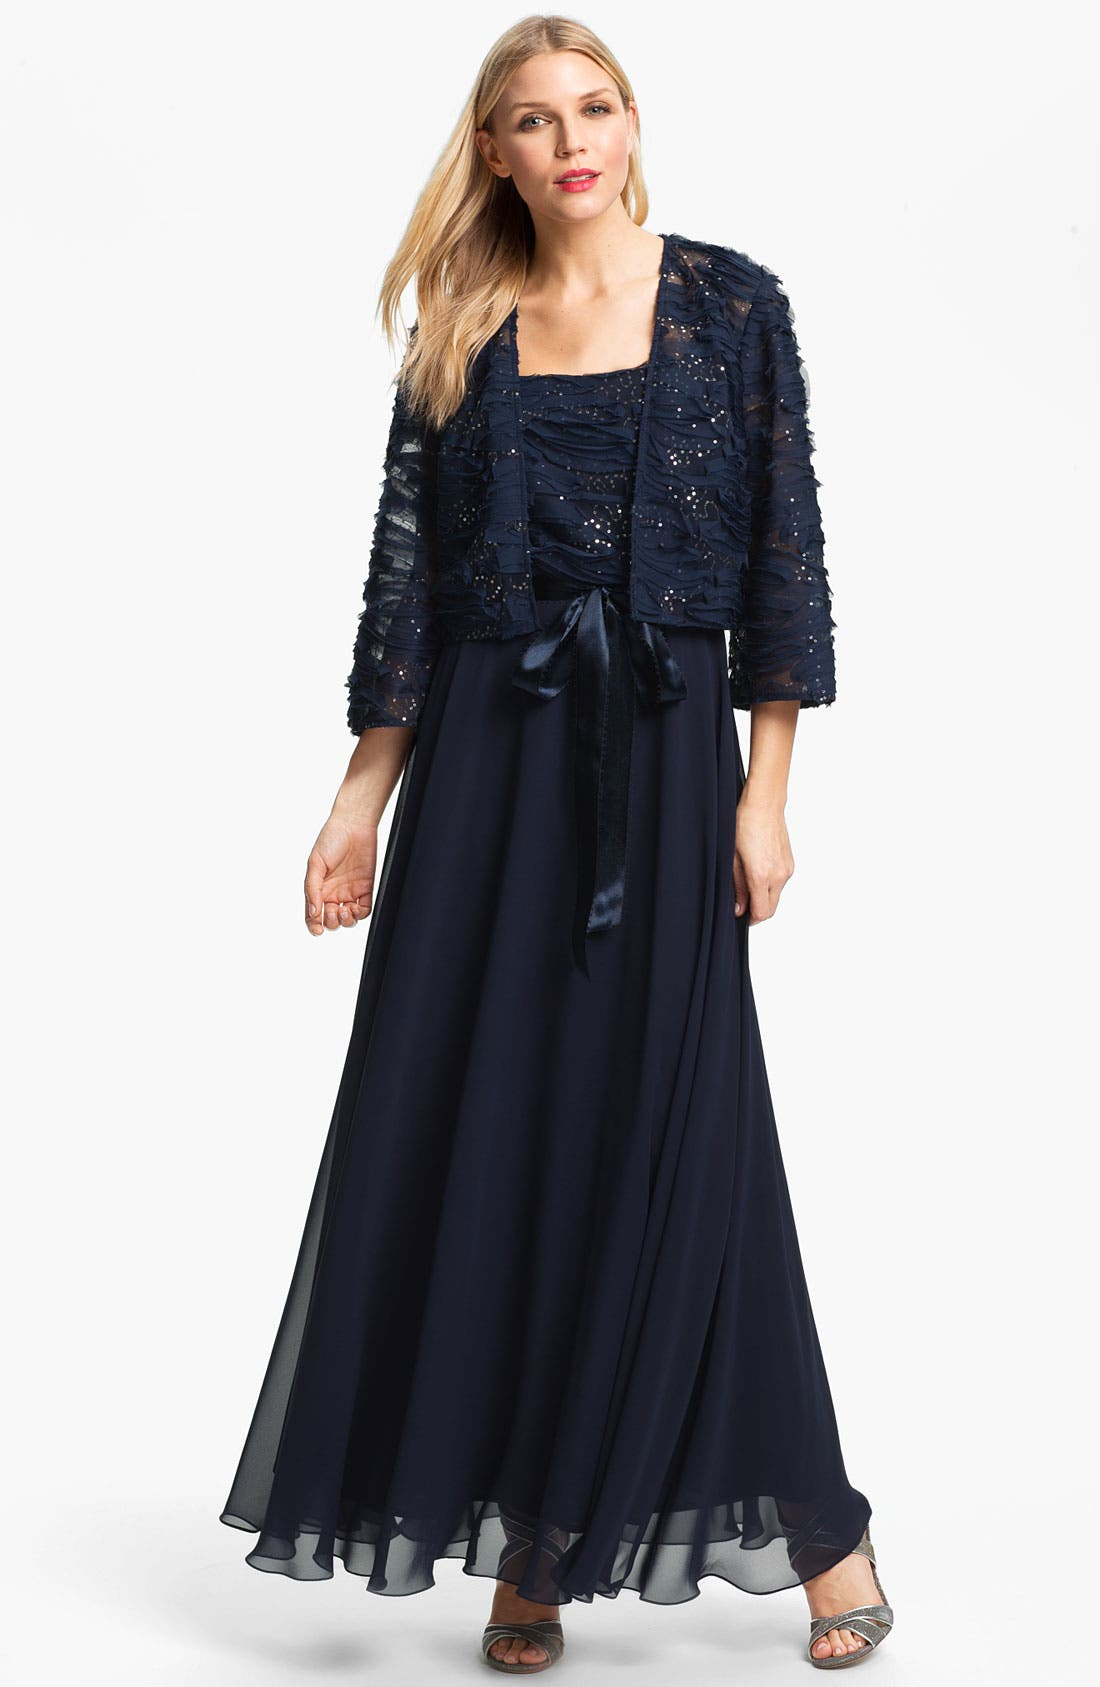 Alternate Image 1 Selected - Patra Embellished Chiffon Gown & Jacket